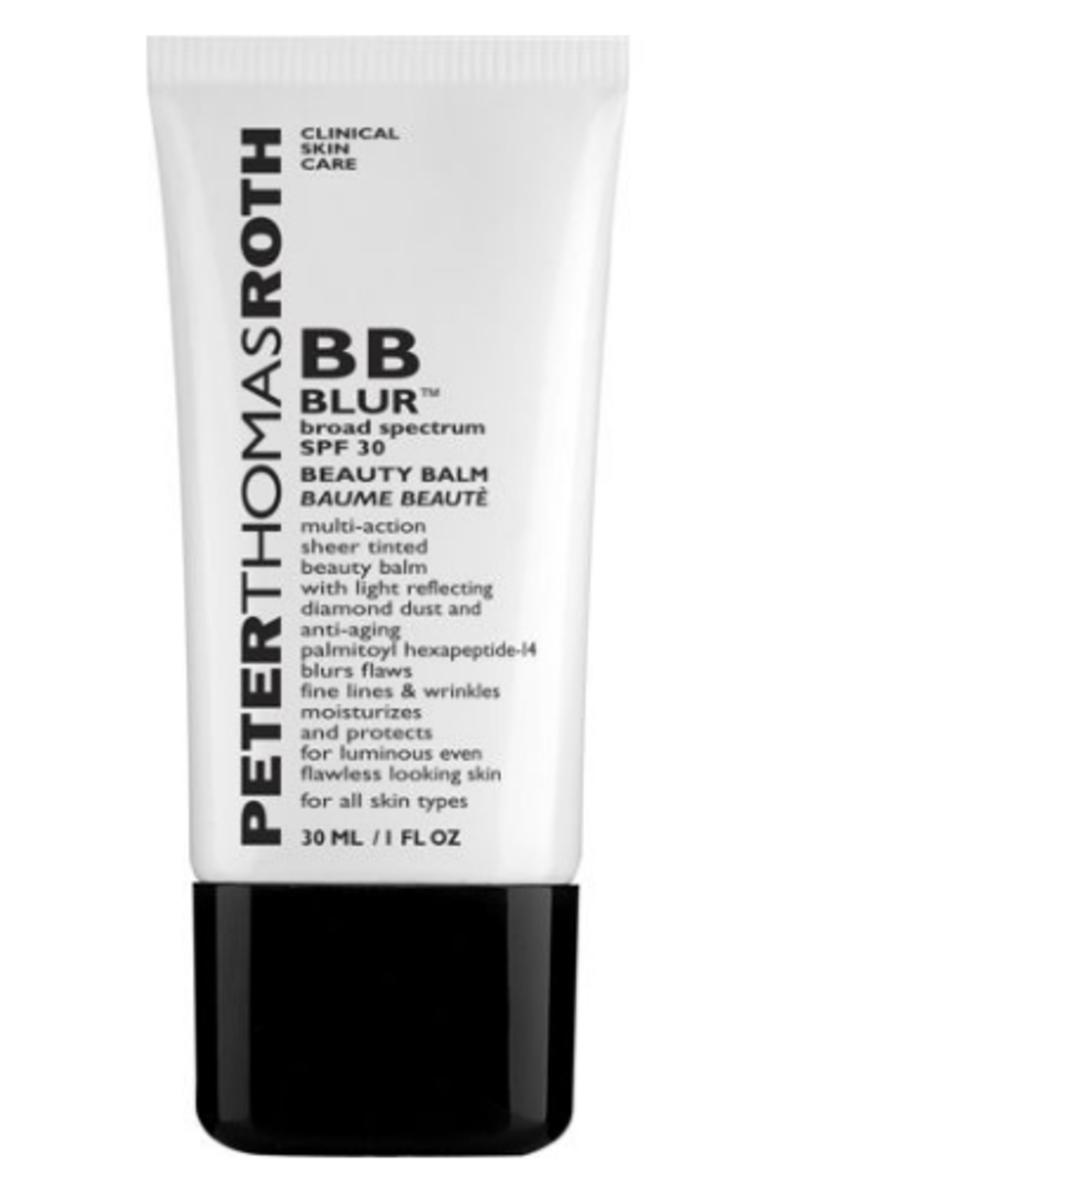 Peter Thomas Roth BB Cream